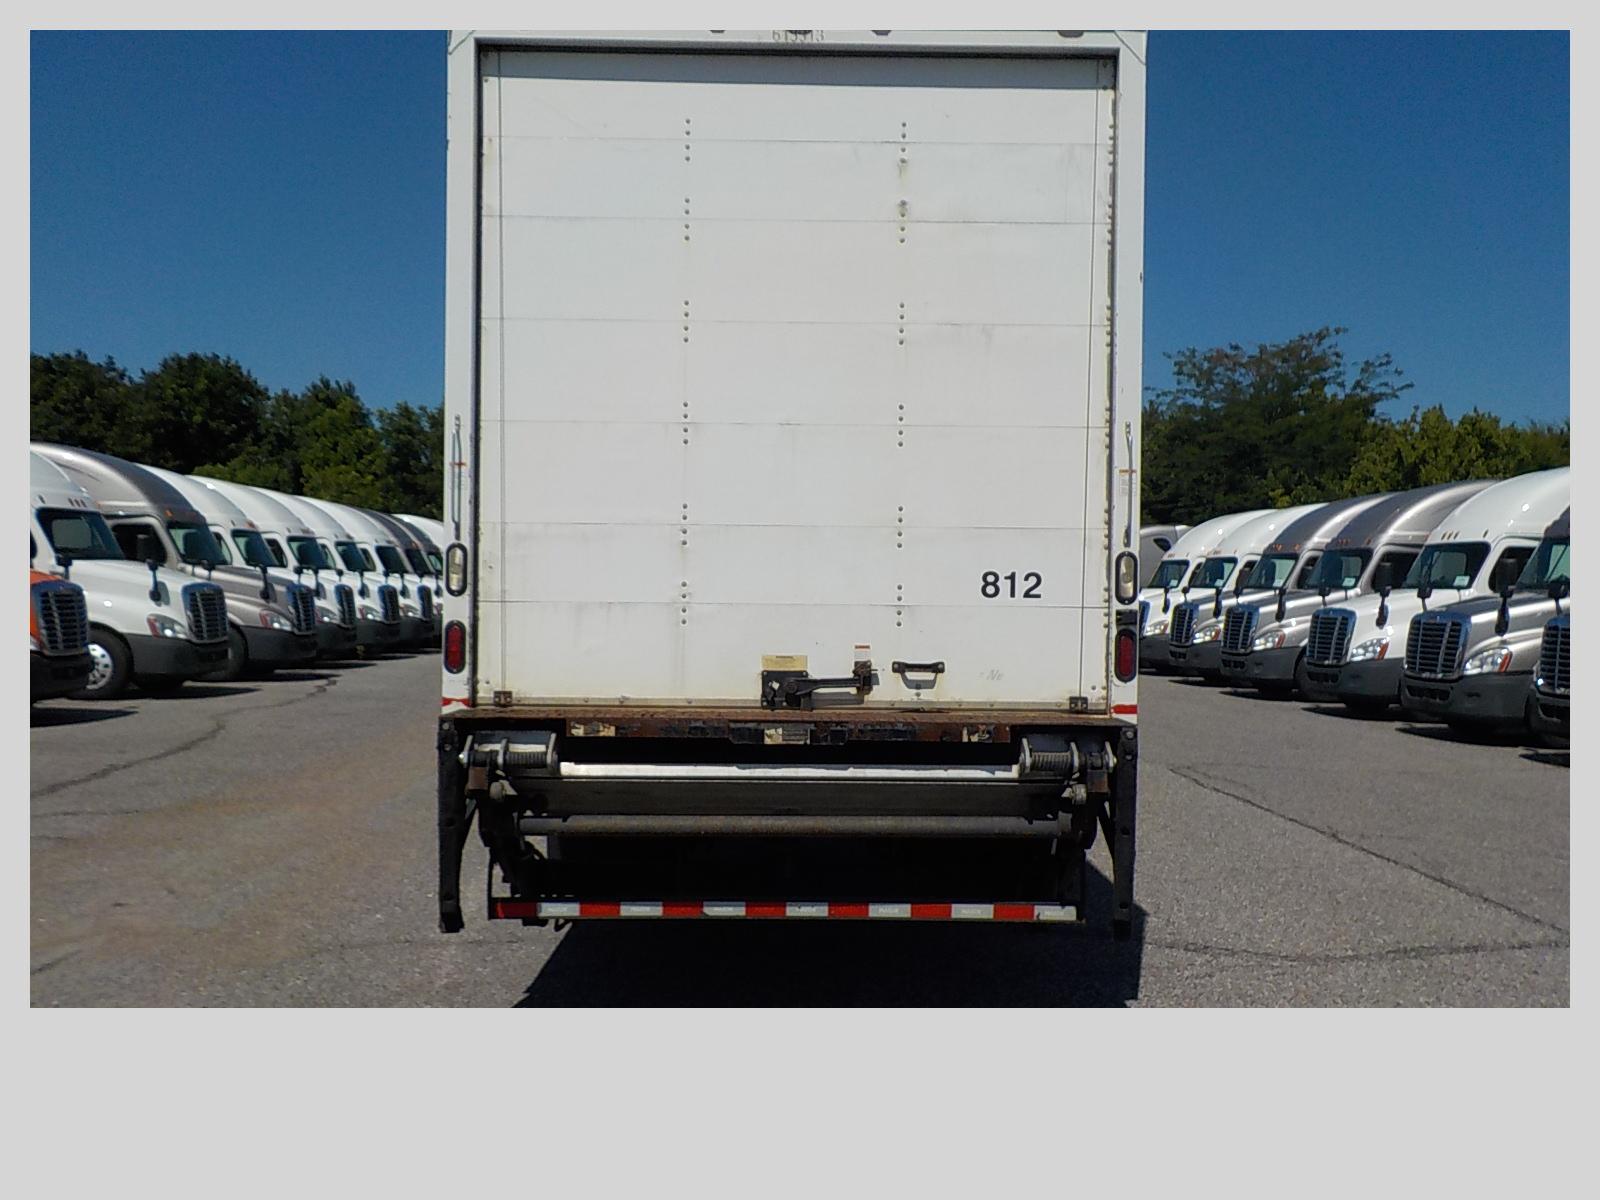 2012 Freightliner M2 for sale-59275559